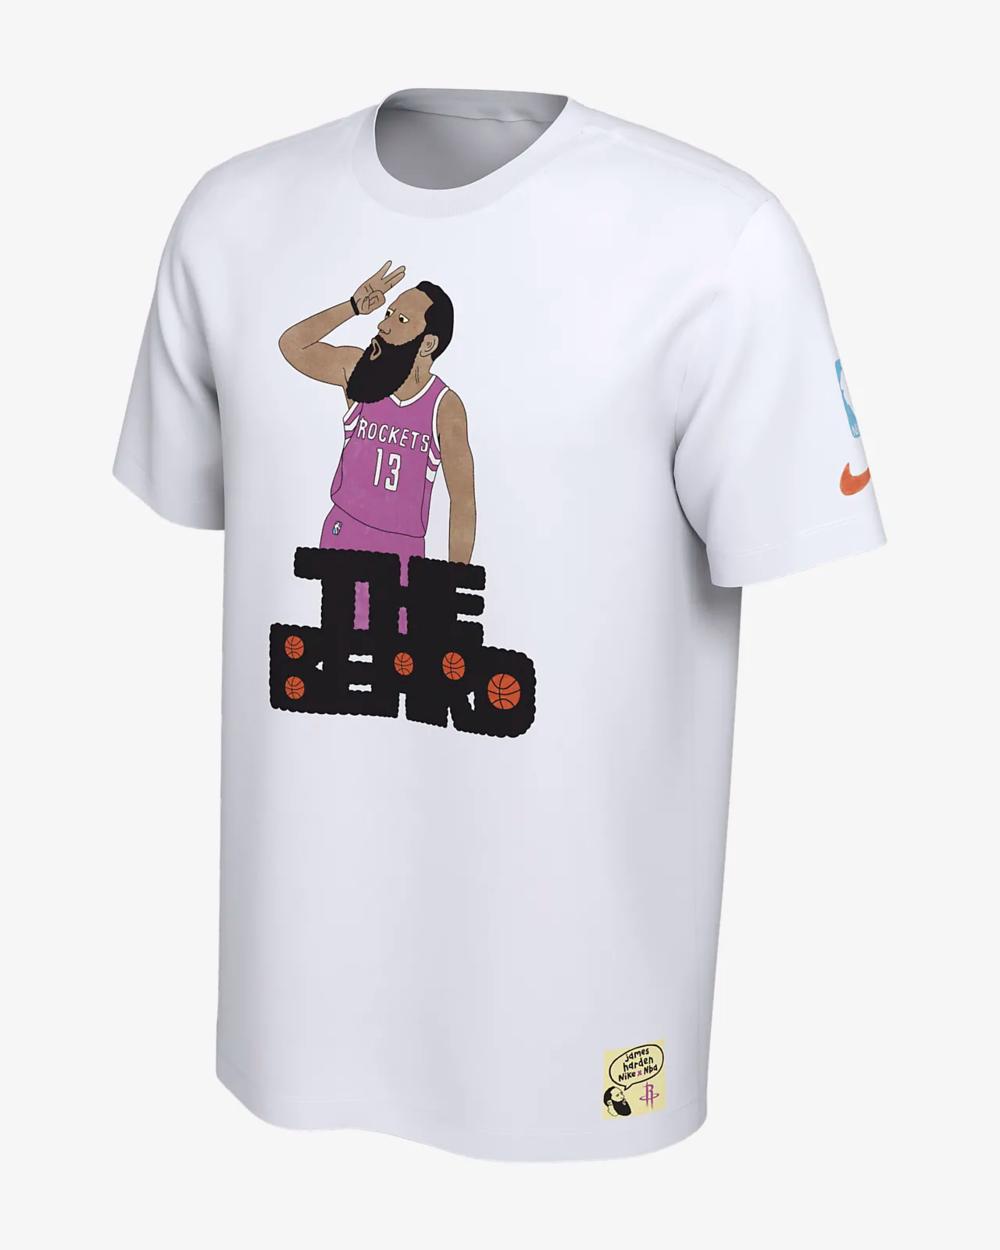 gangster-doodles-the-beard-mens-nba-nickname-t-shirt-g7V1Rt.png